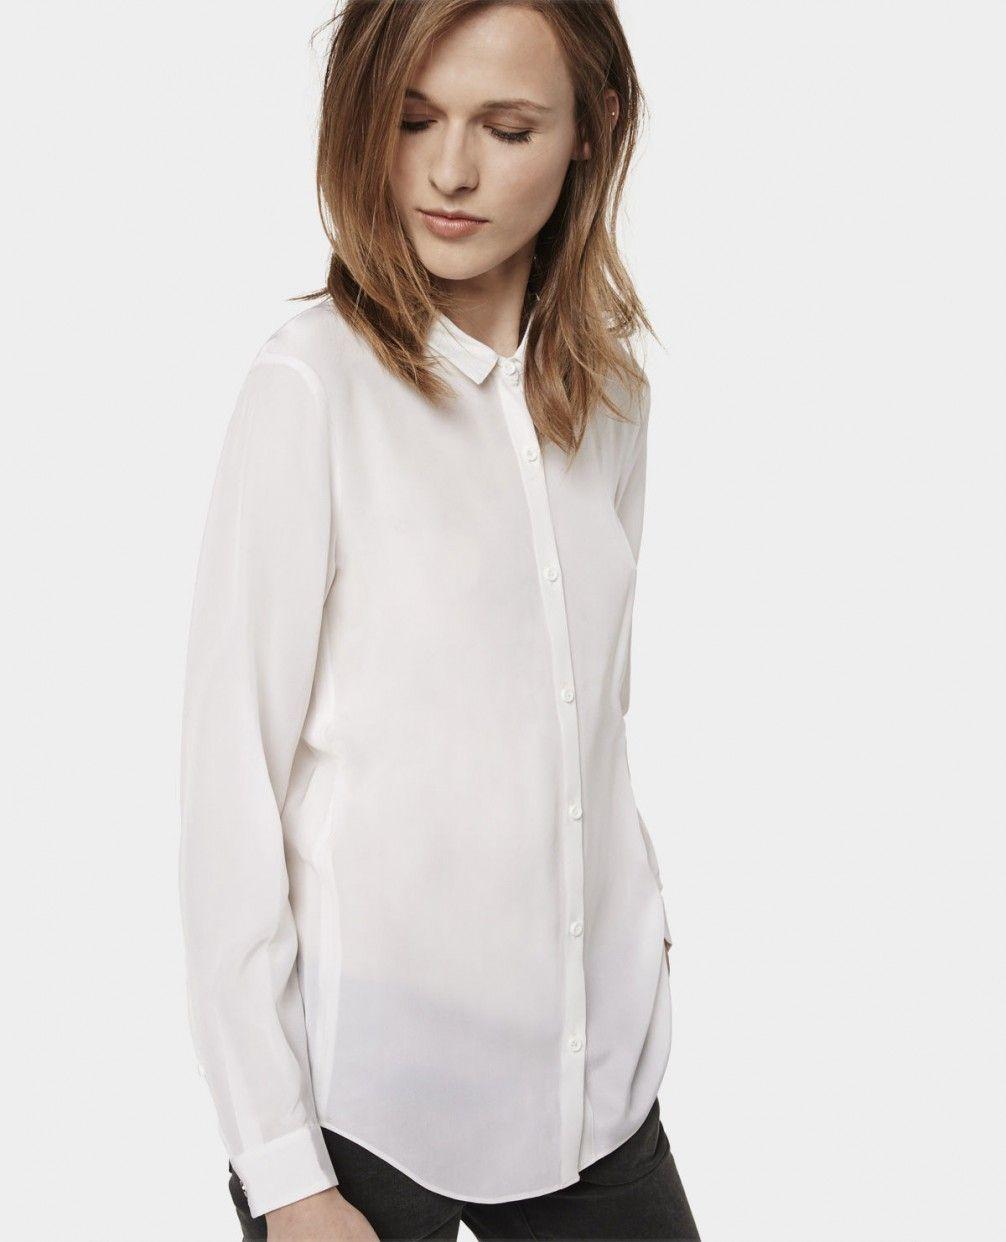 Plain silk boyfriend shirt - Shirts - Woman - The Kooples